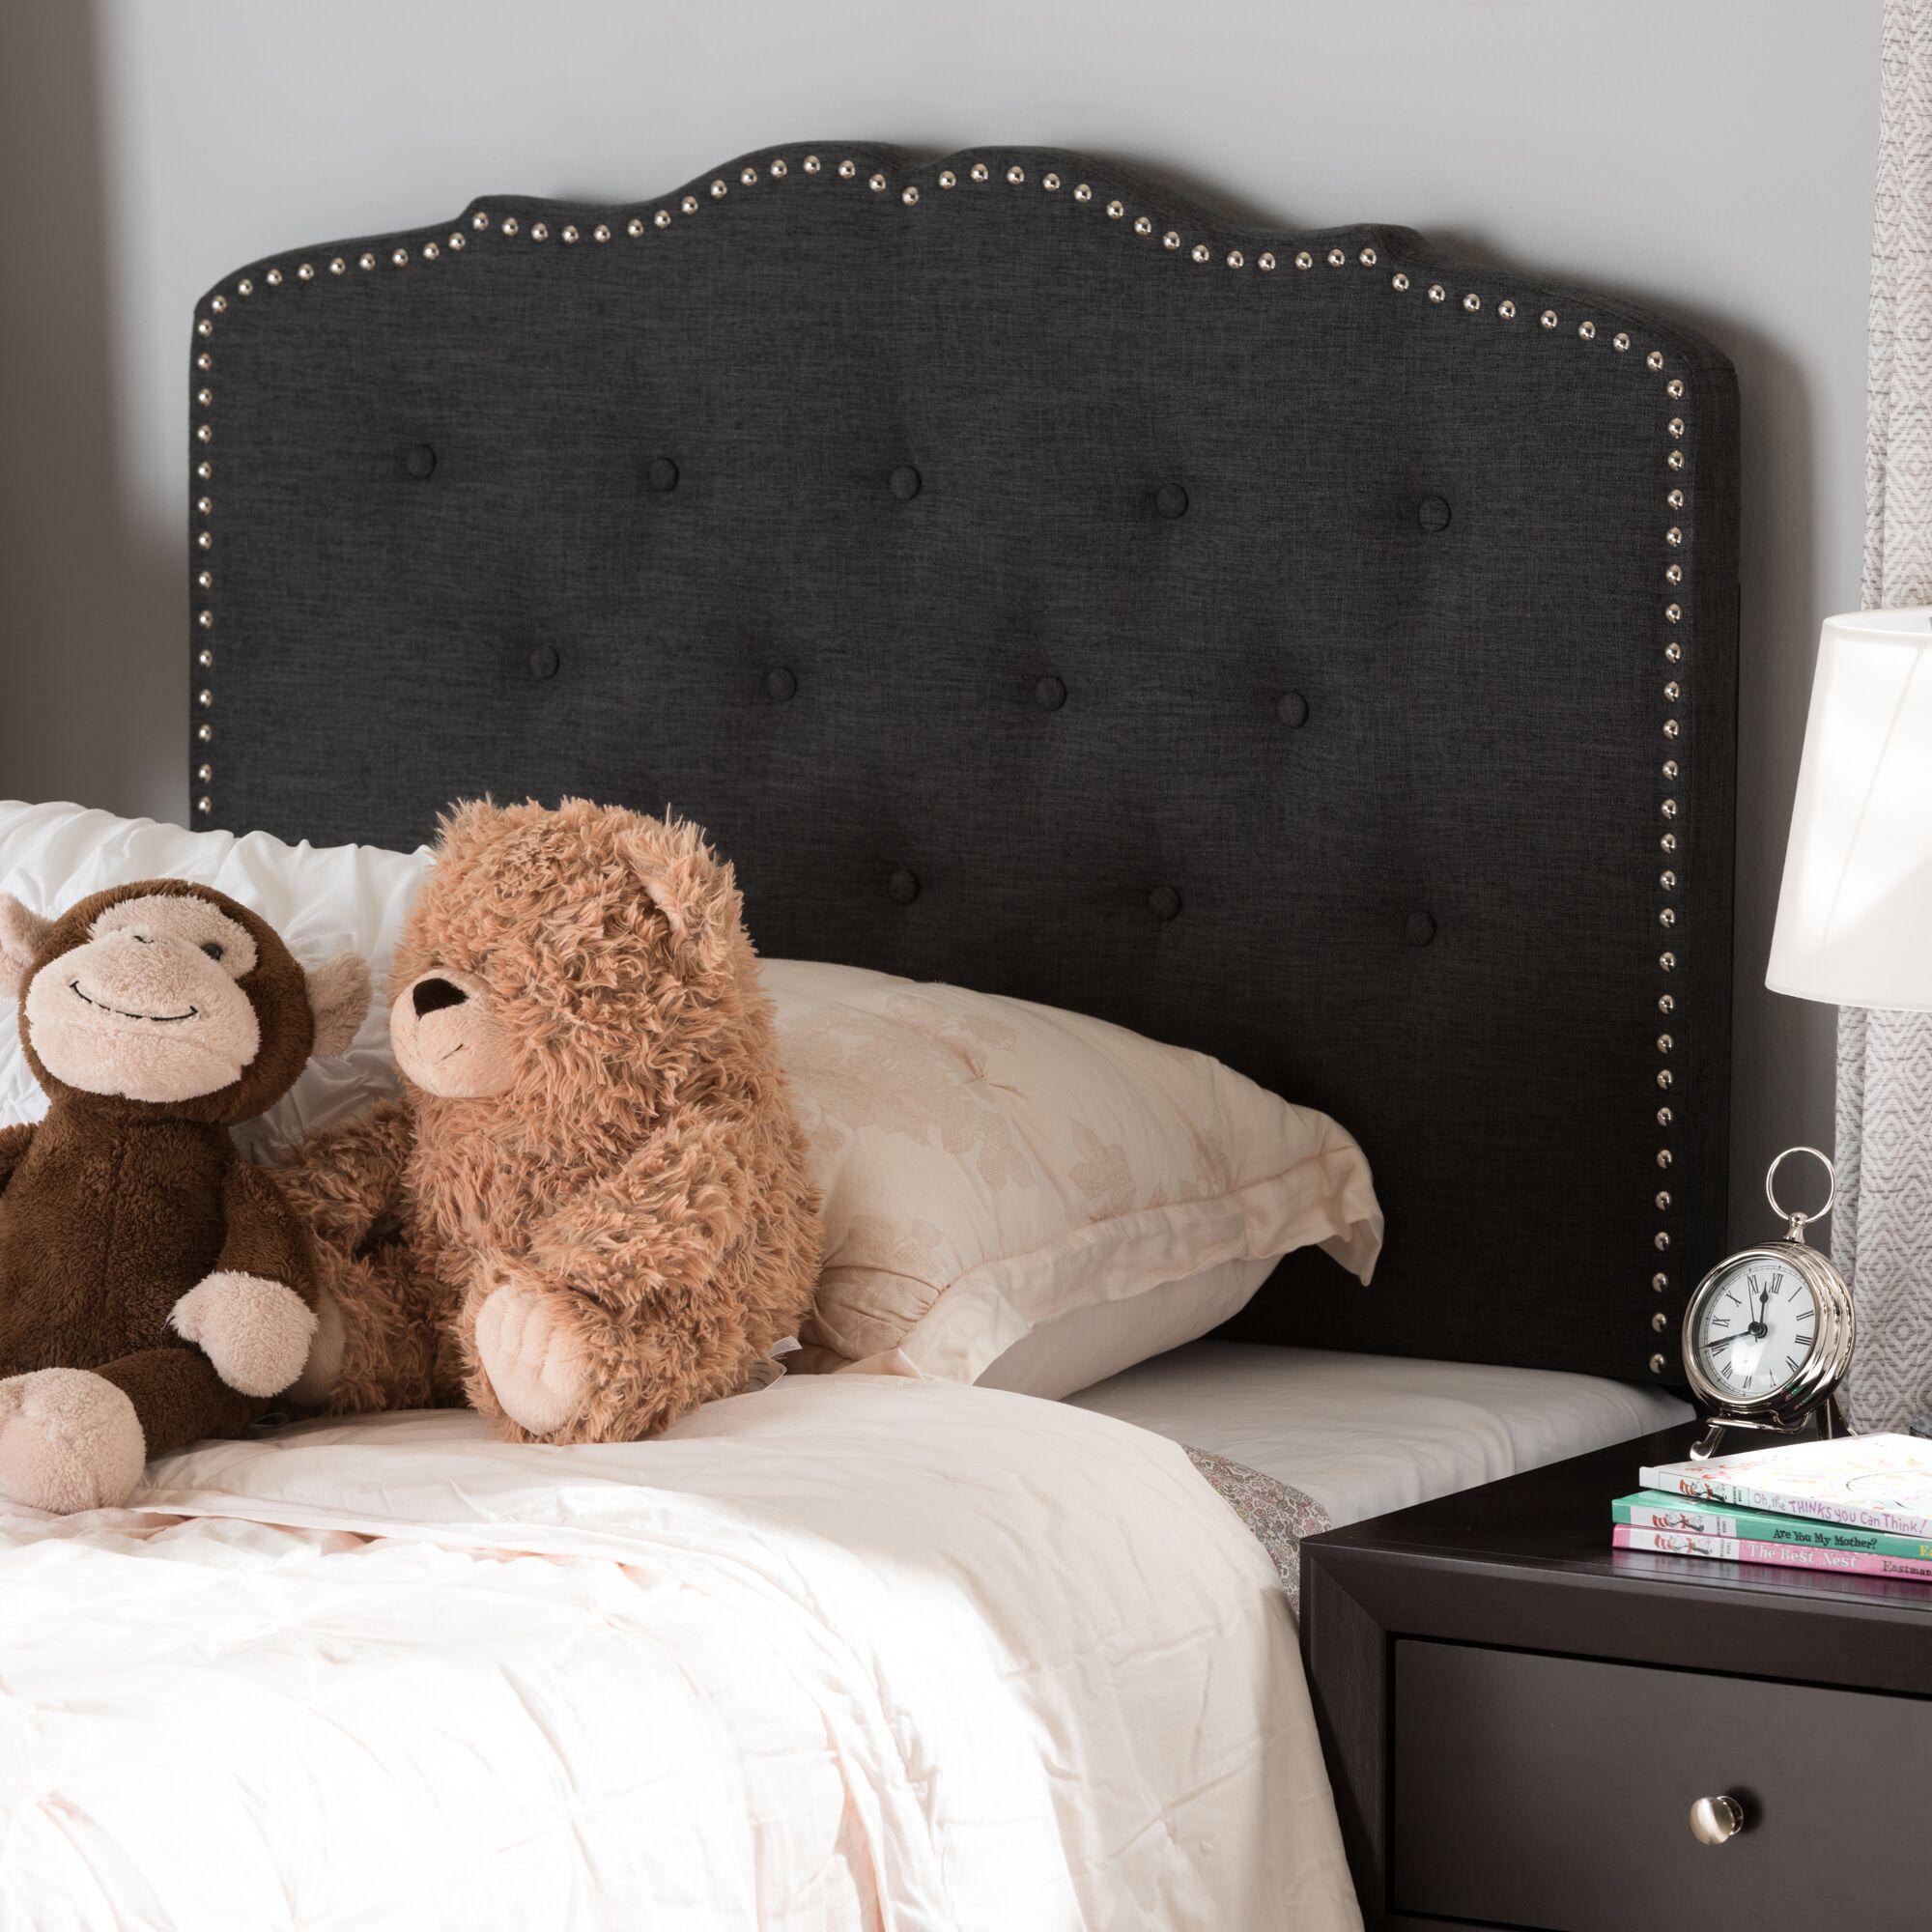 Fabiana Upholstered Panel Headboard Upholstery: Dark Gray, Size: Full